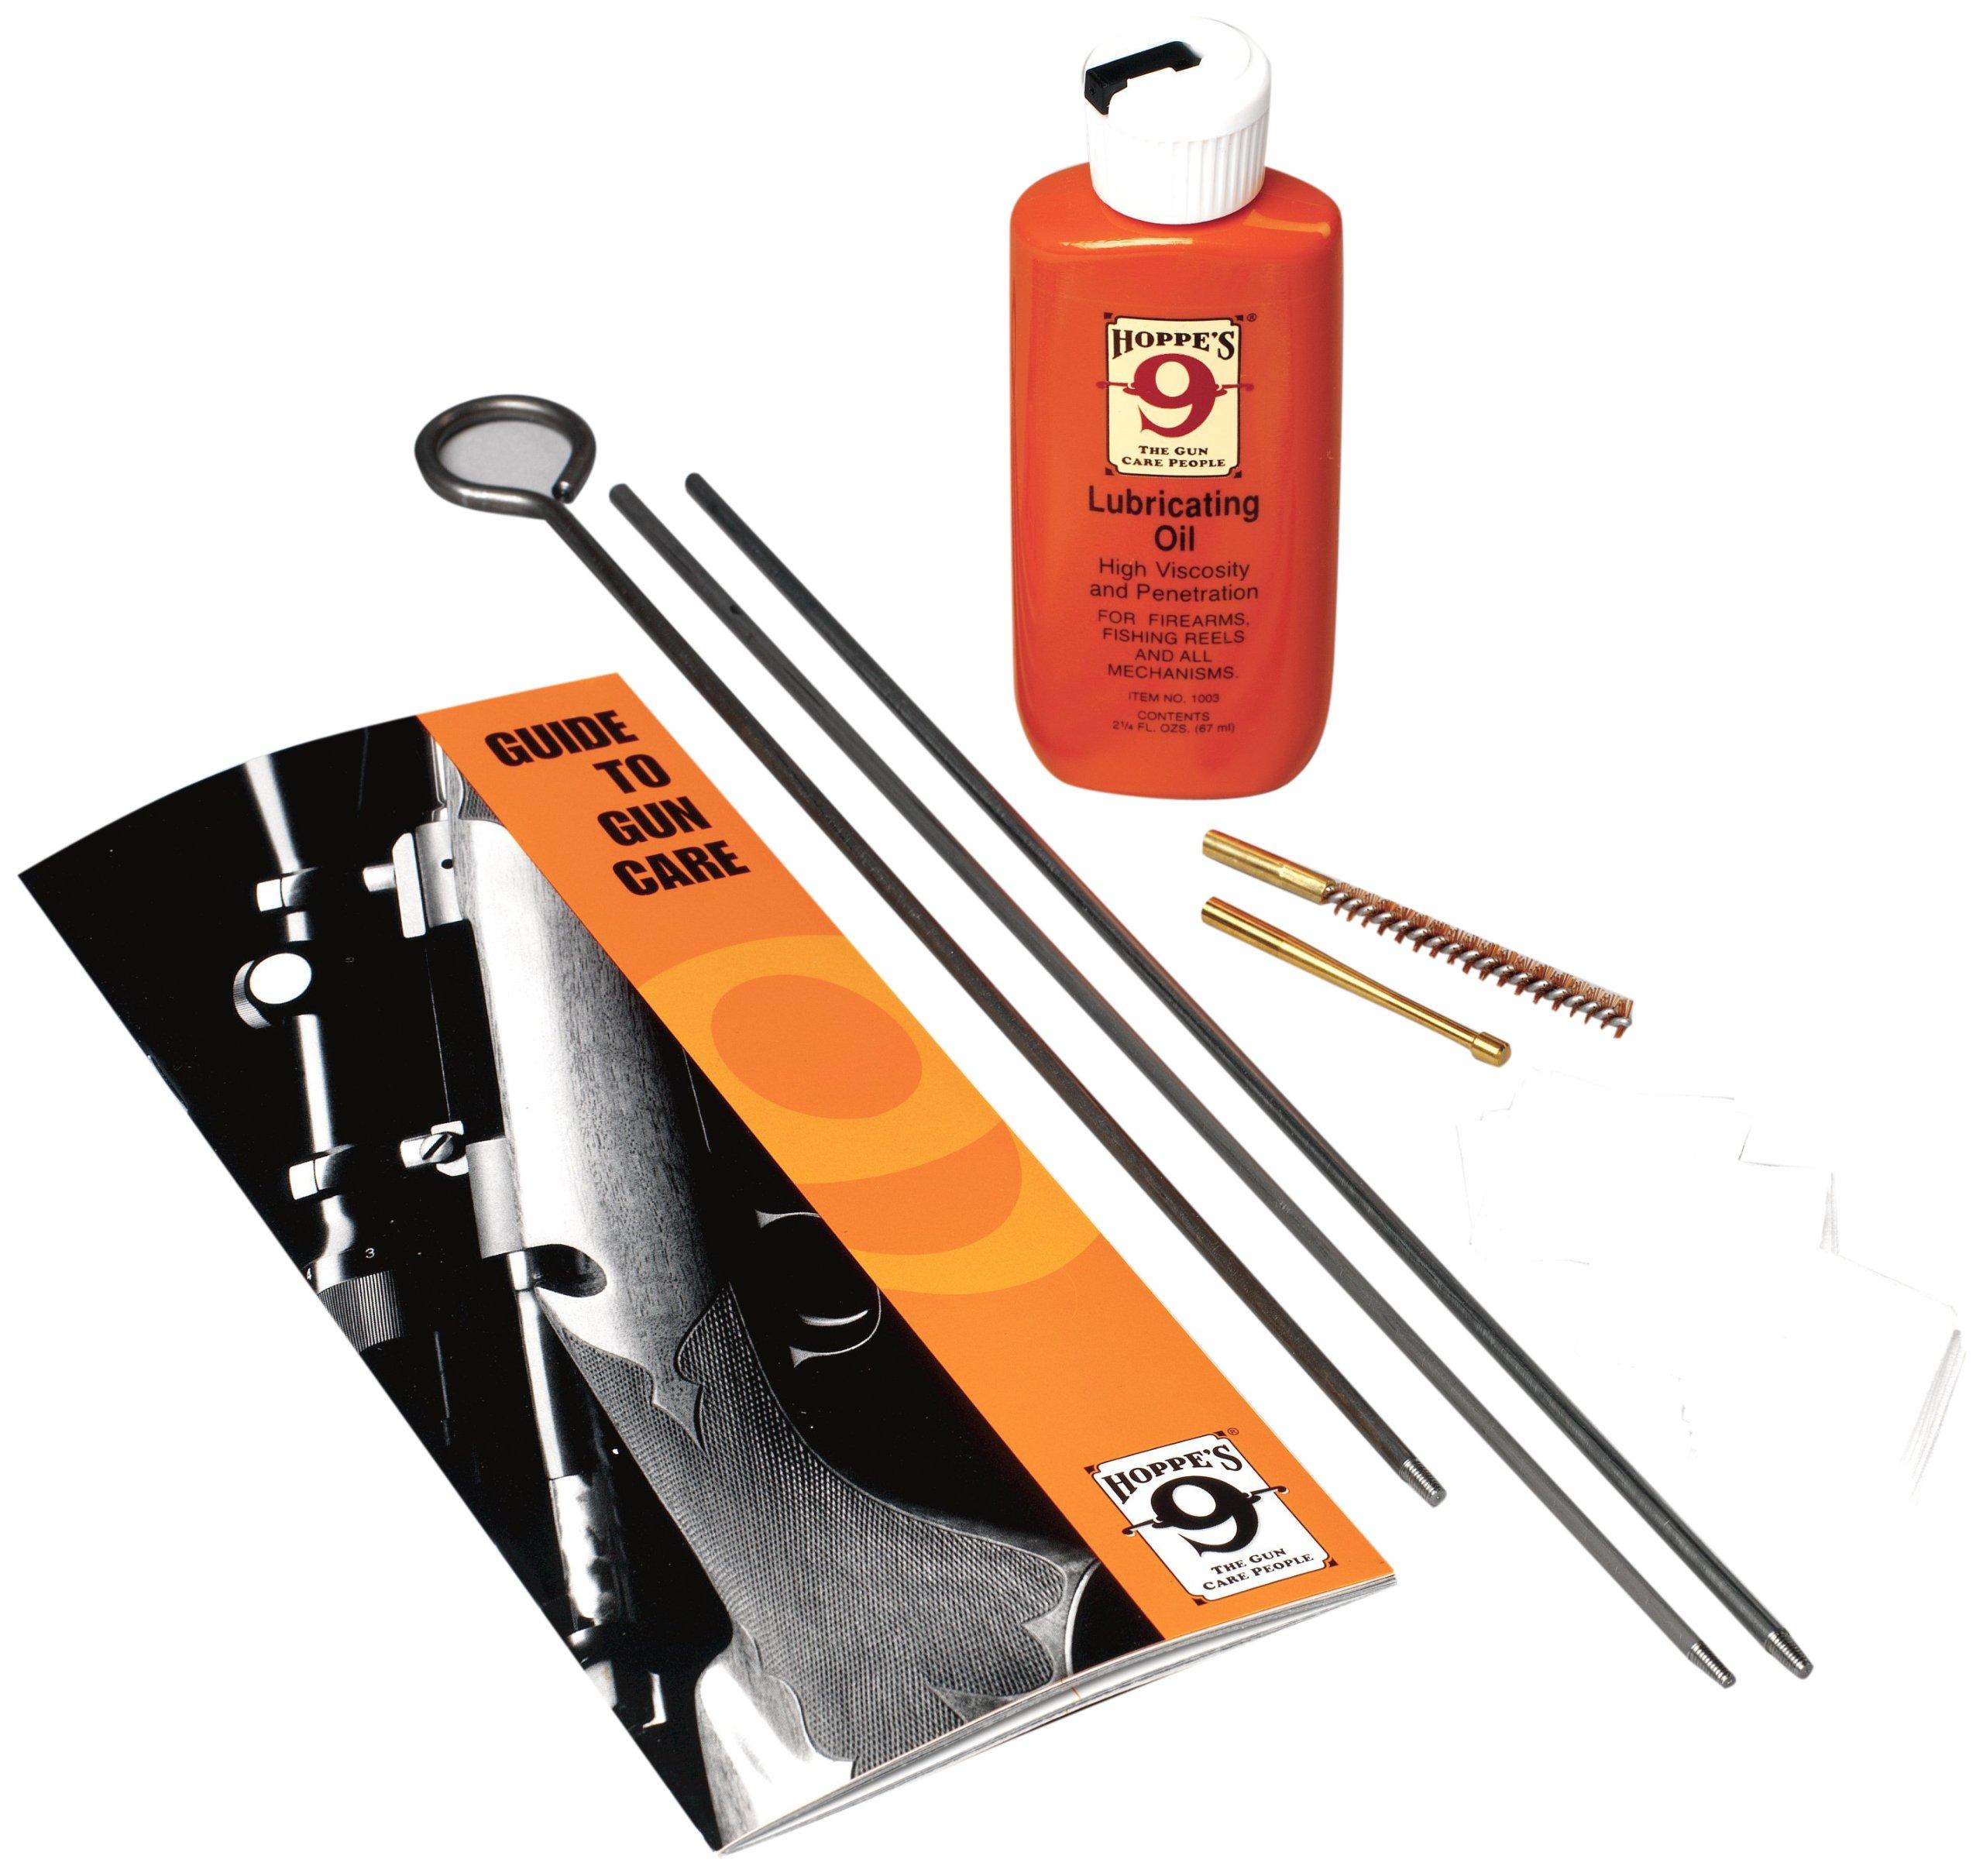 Hoppe's Air Pistol and Air Rifle Maintenance Kit